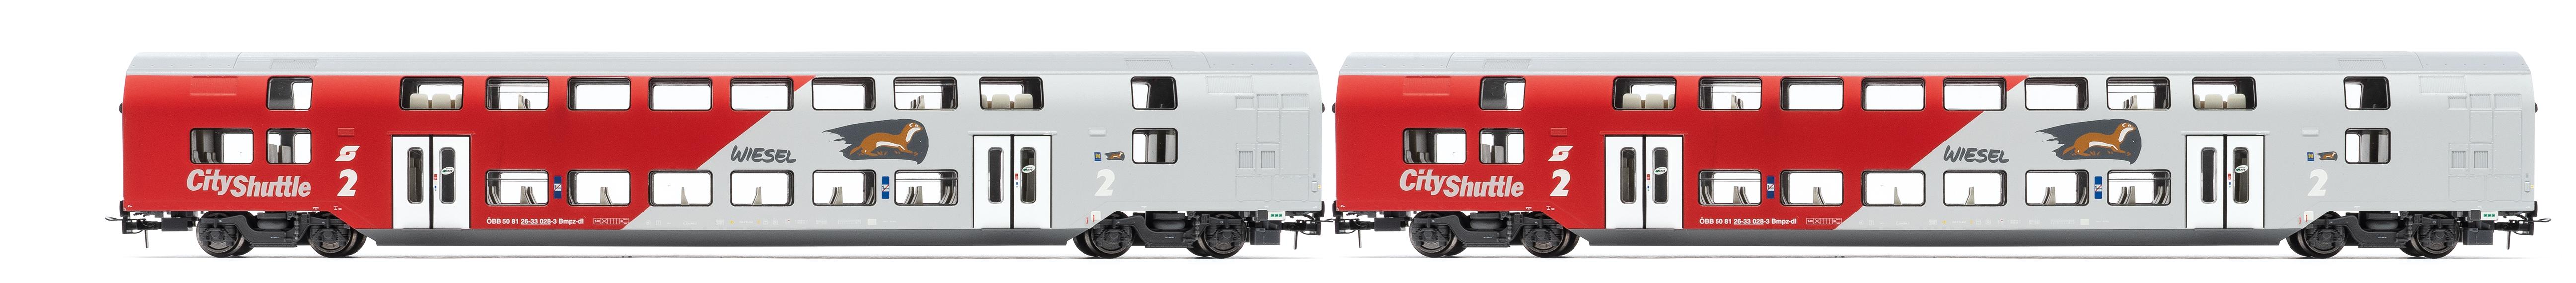 JC60120